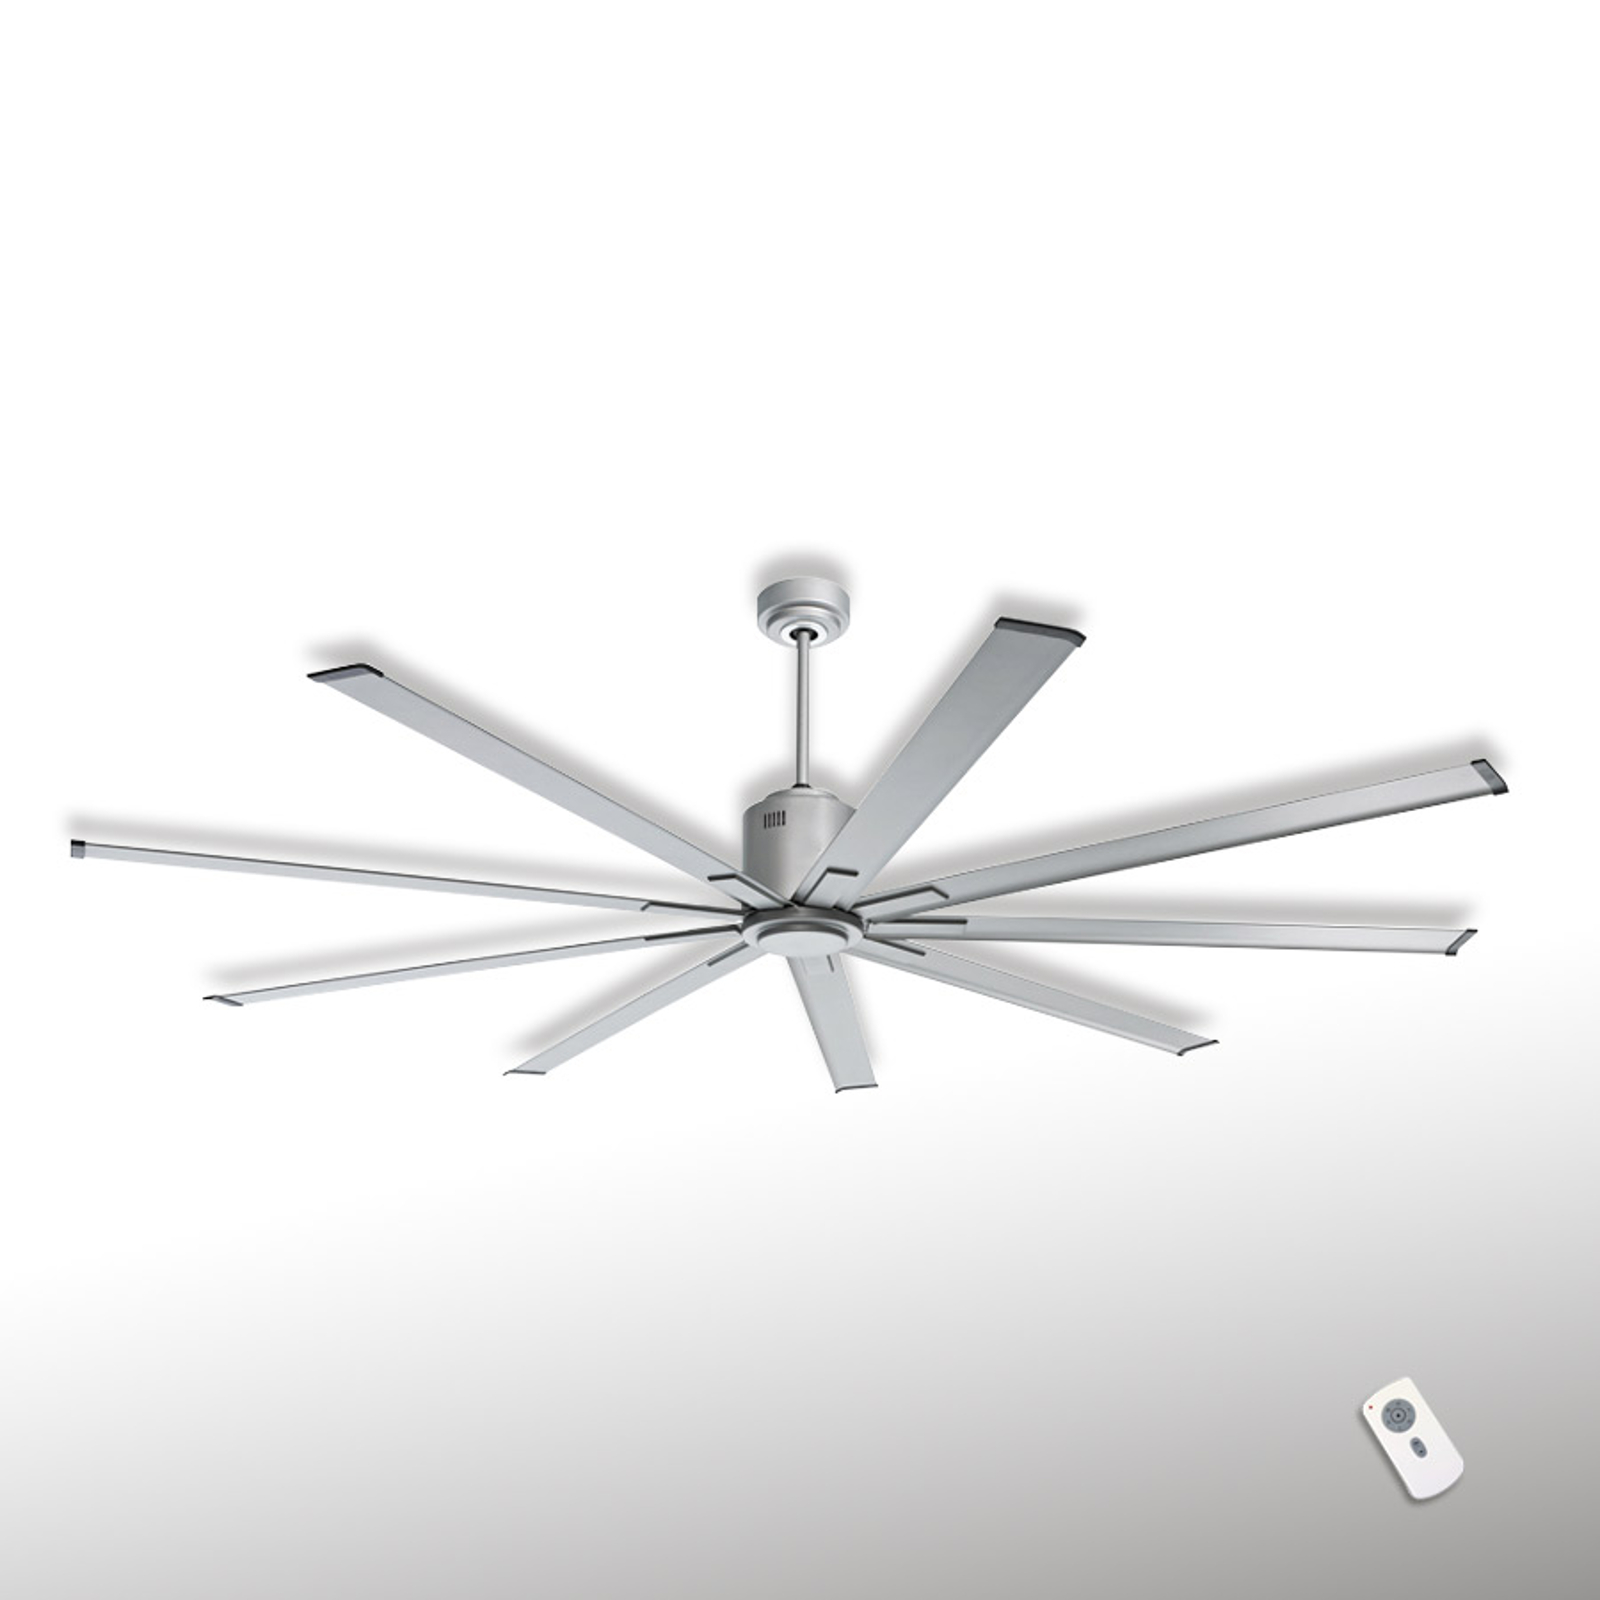 Loftventilator Big Smooth Eco 220 cm titaniumsølv